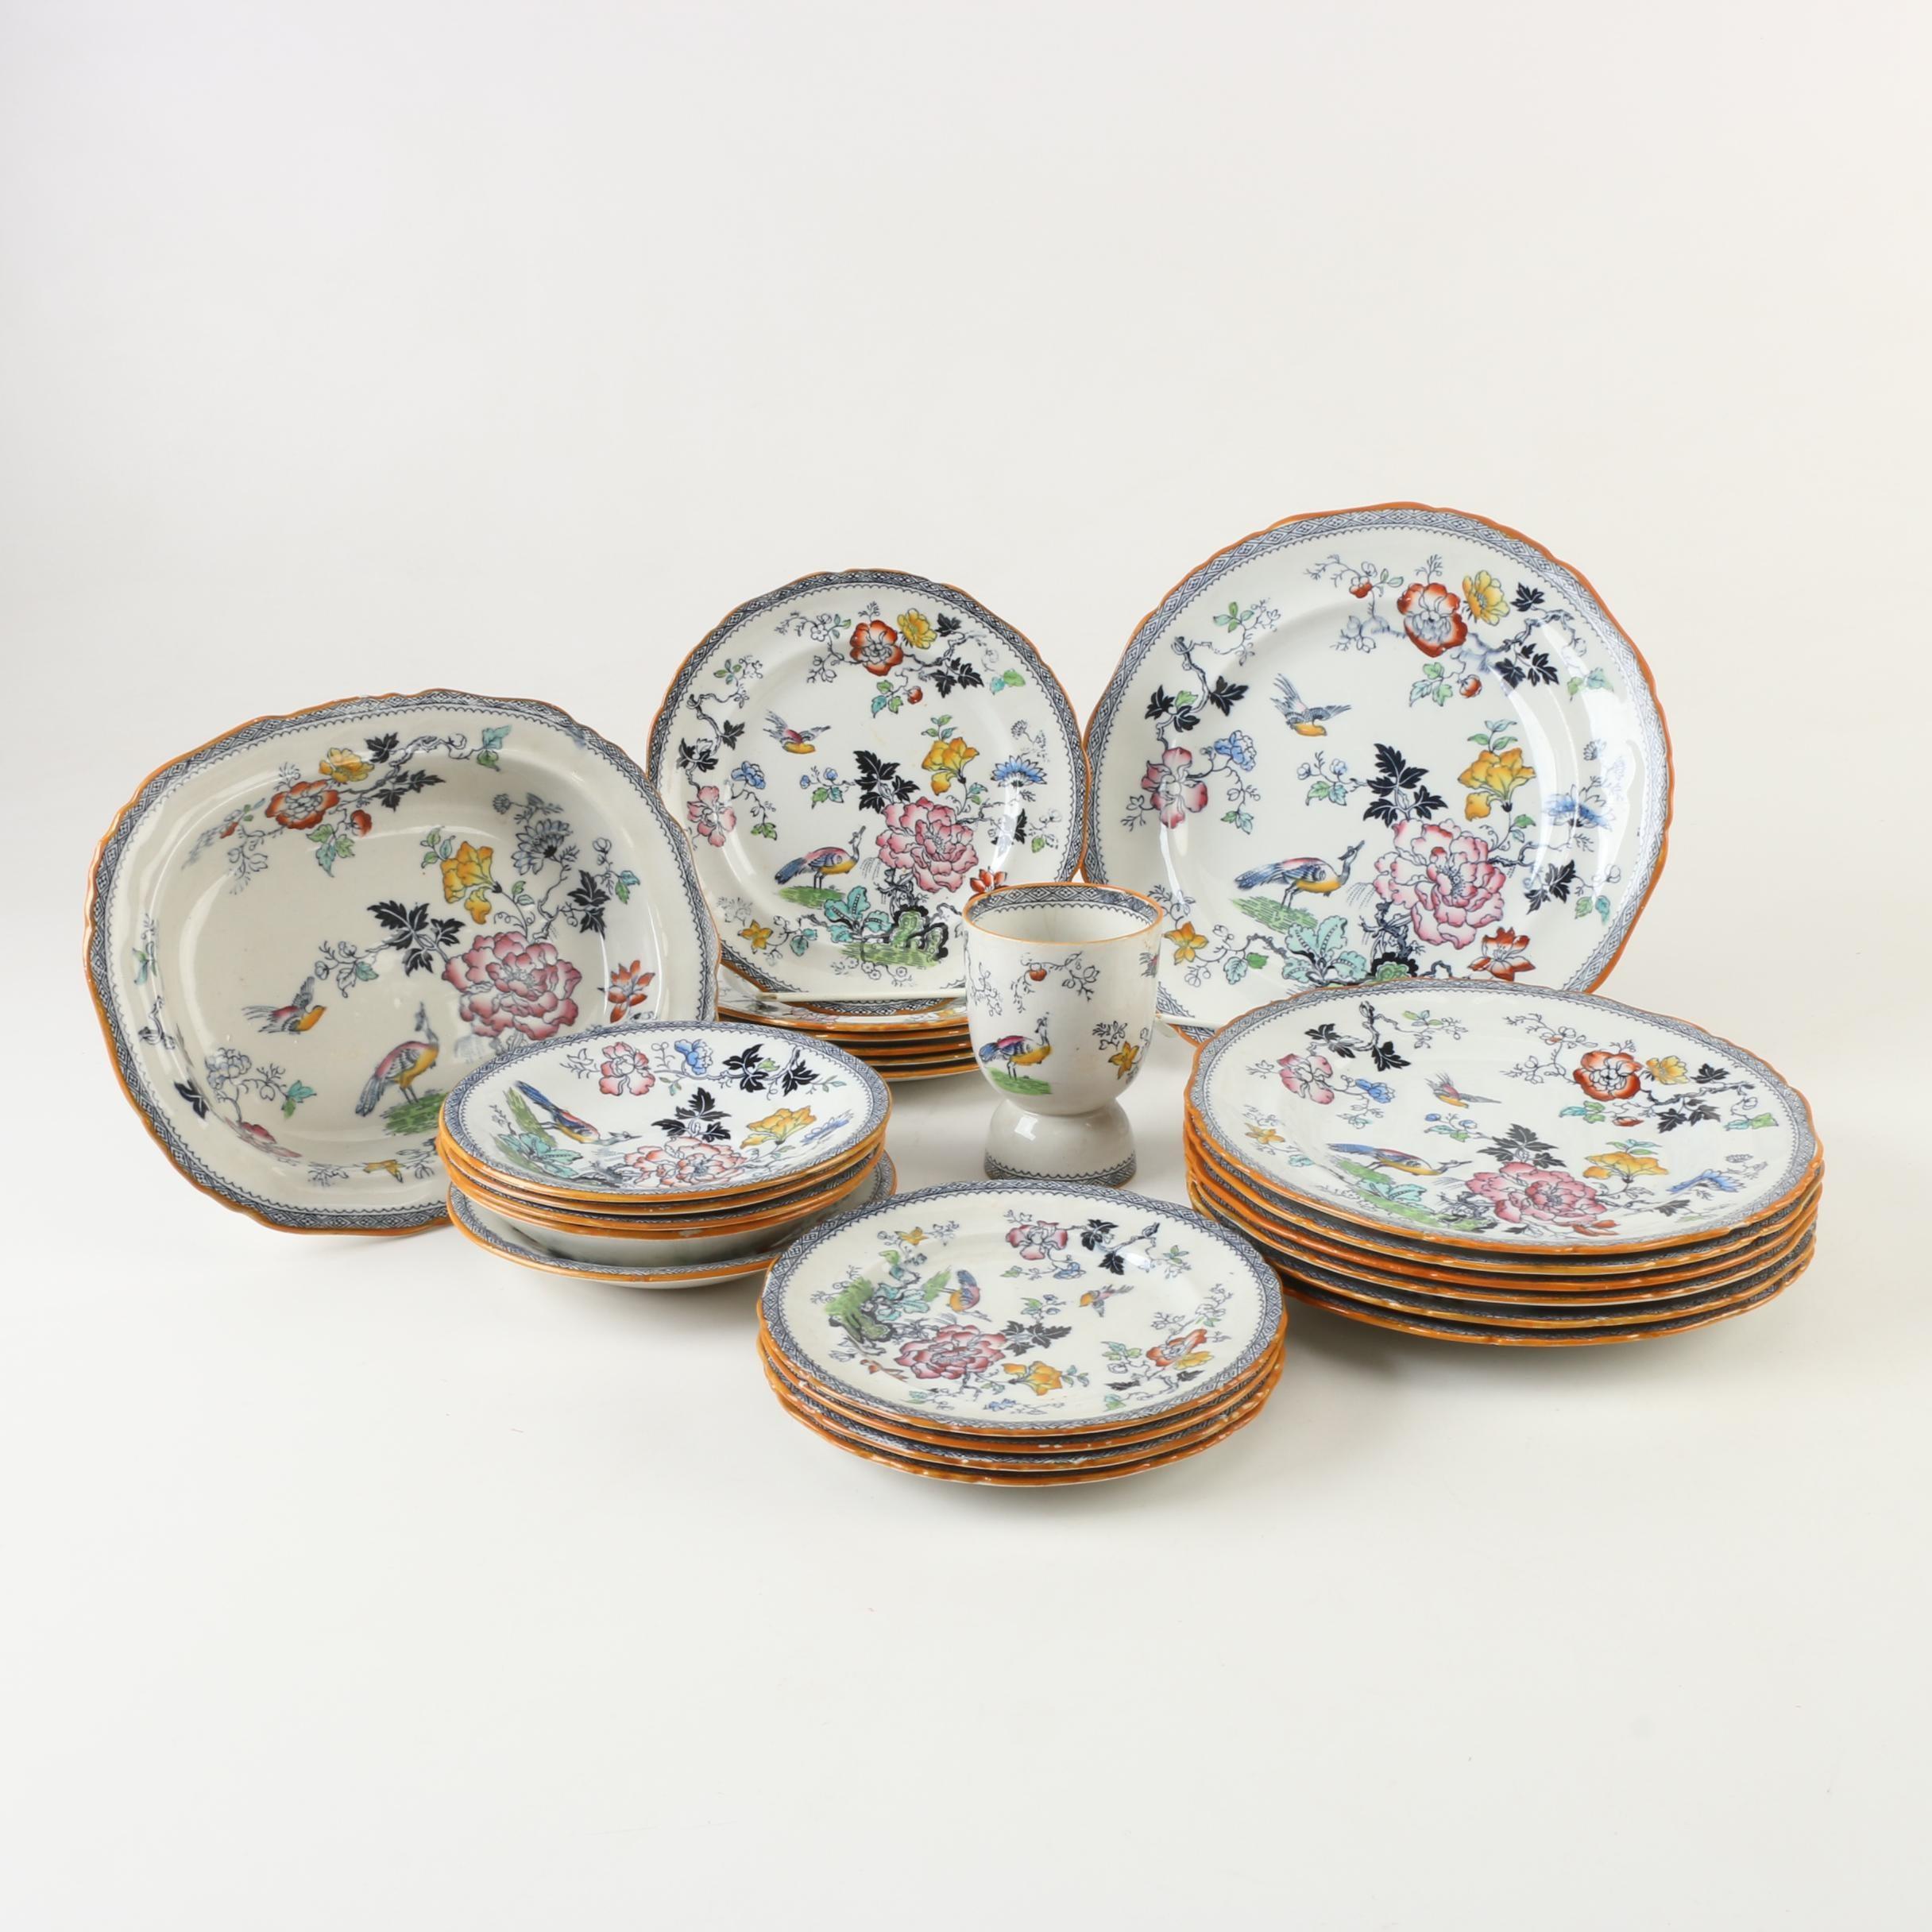 "Antique Ashworth Bros. ""Formosa"" Ironstone Dinnerware 1891-1900"